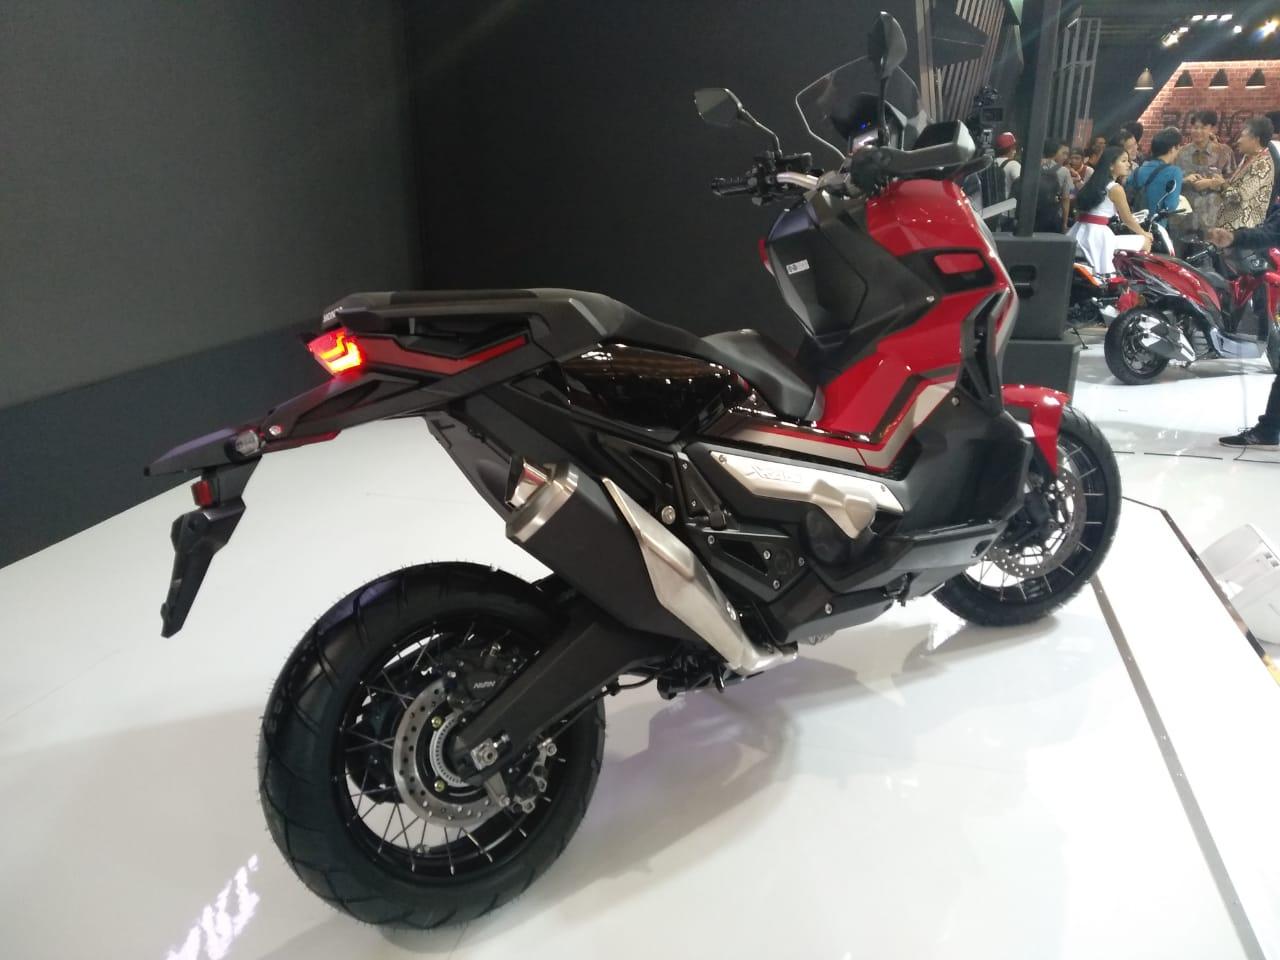 Honda X-ADV jadi Sepeda Motor Matik untuk Berpetualang